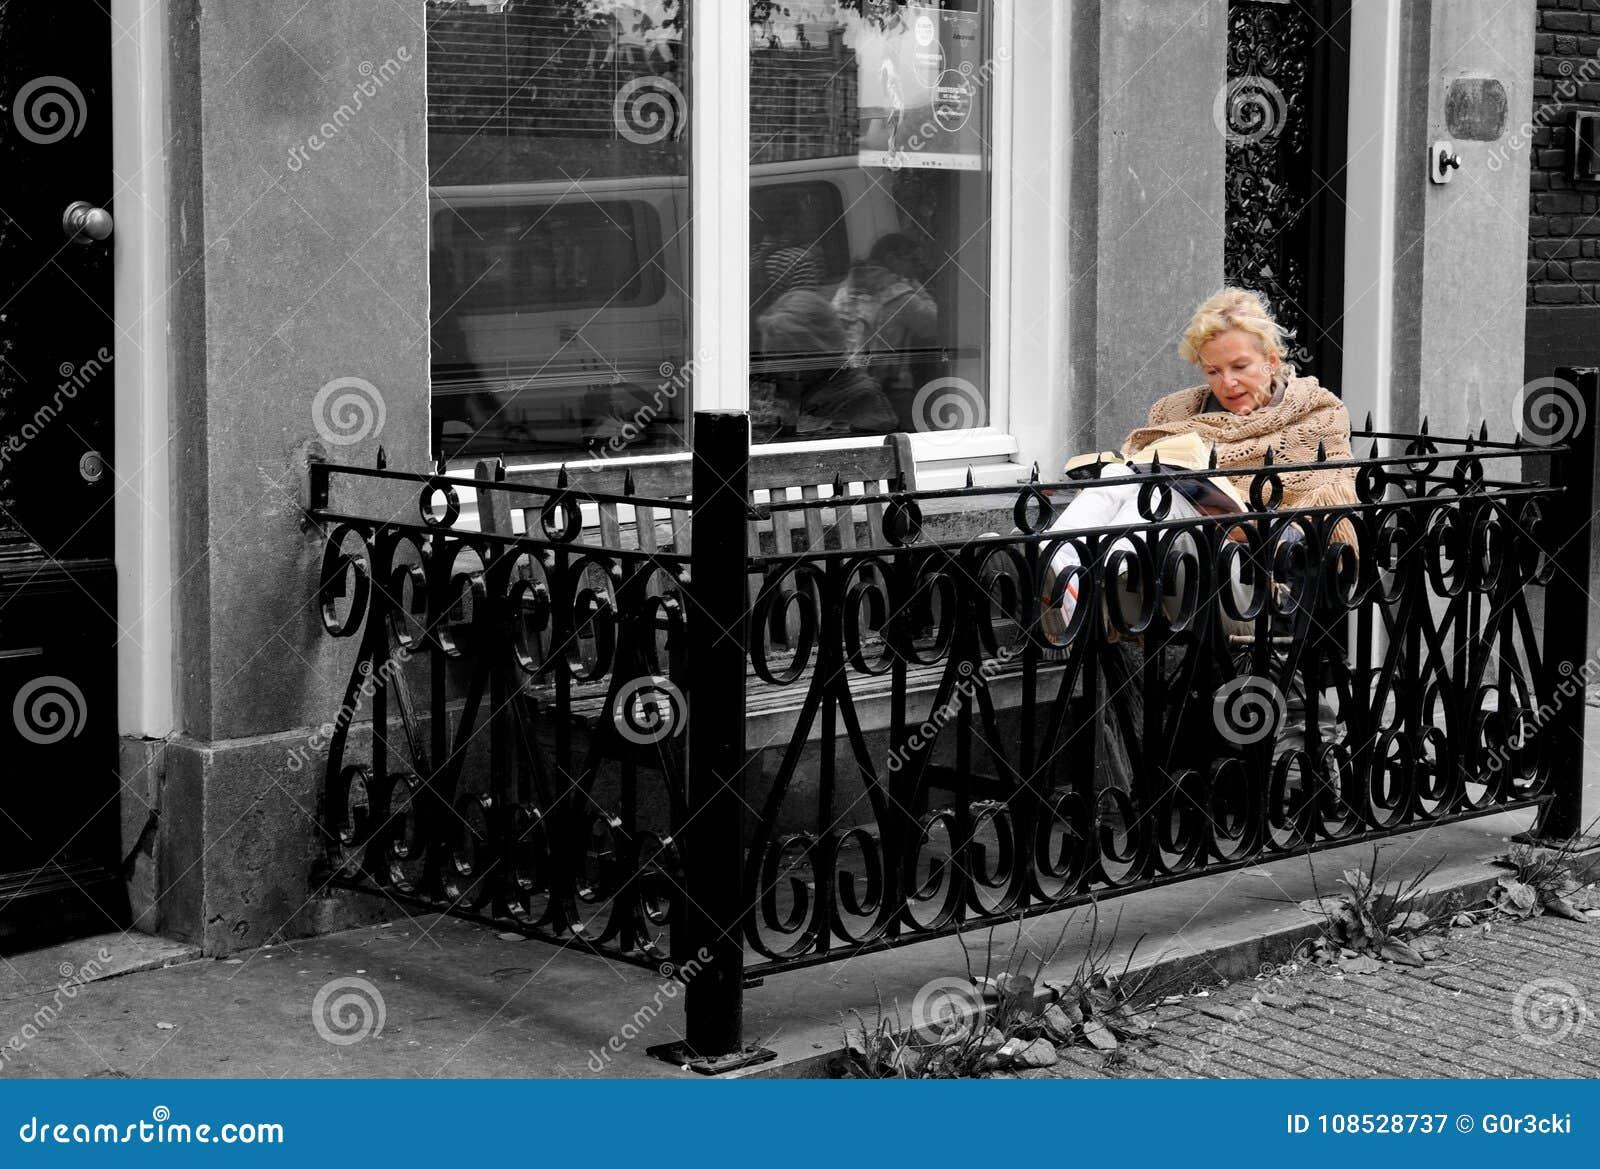 Reading a Book, Street Balcony, Nordic Outdoor Lifestyle, Beautiful Elder Blonde Woman, Amsterdam